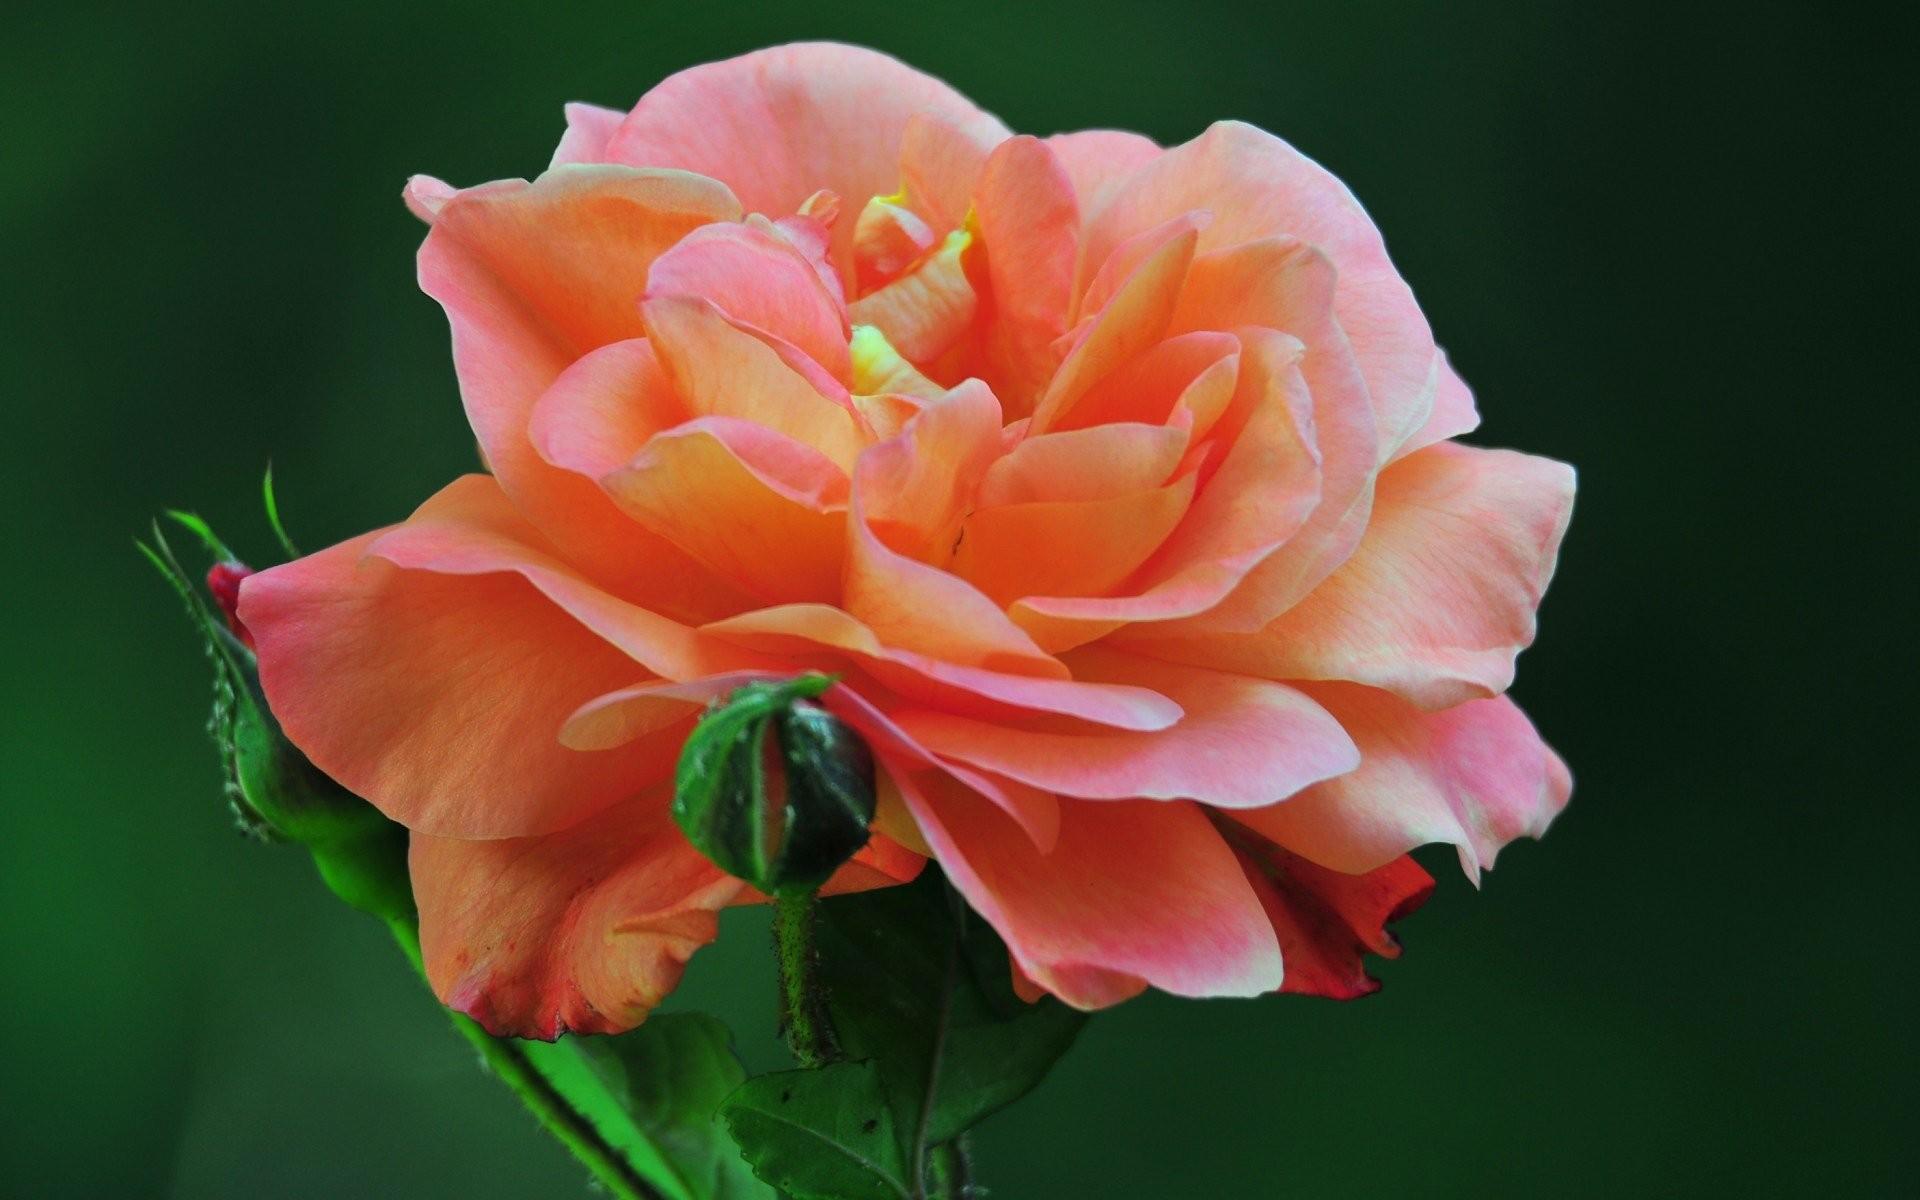 Beautiful rose flowers wallpapers 52 images 2500x1562 image wallpaper rose flowers for pc mac tablet laptop download izmirmasajfo